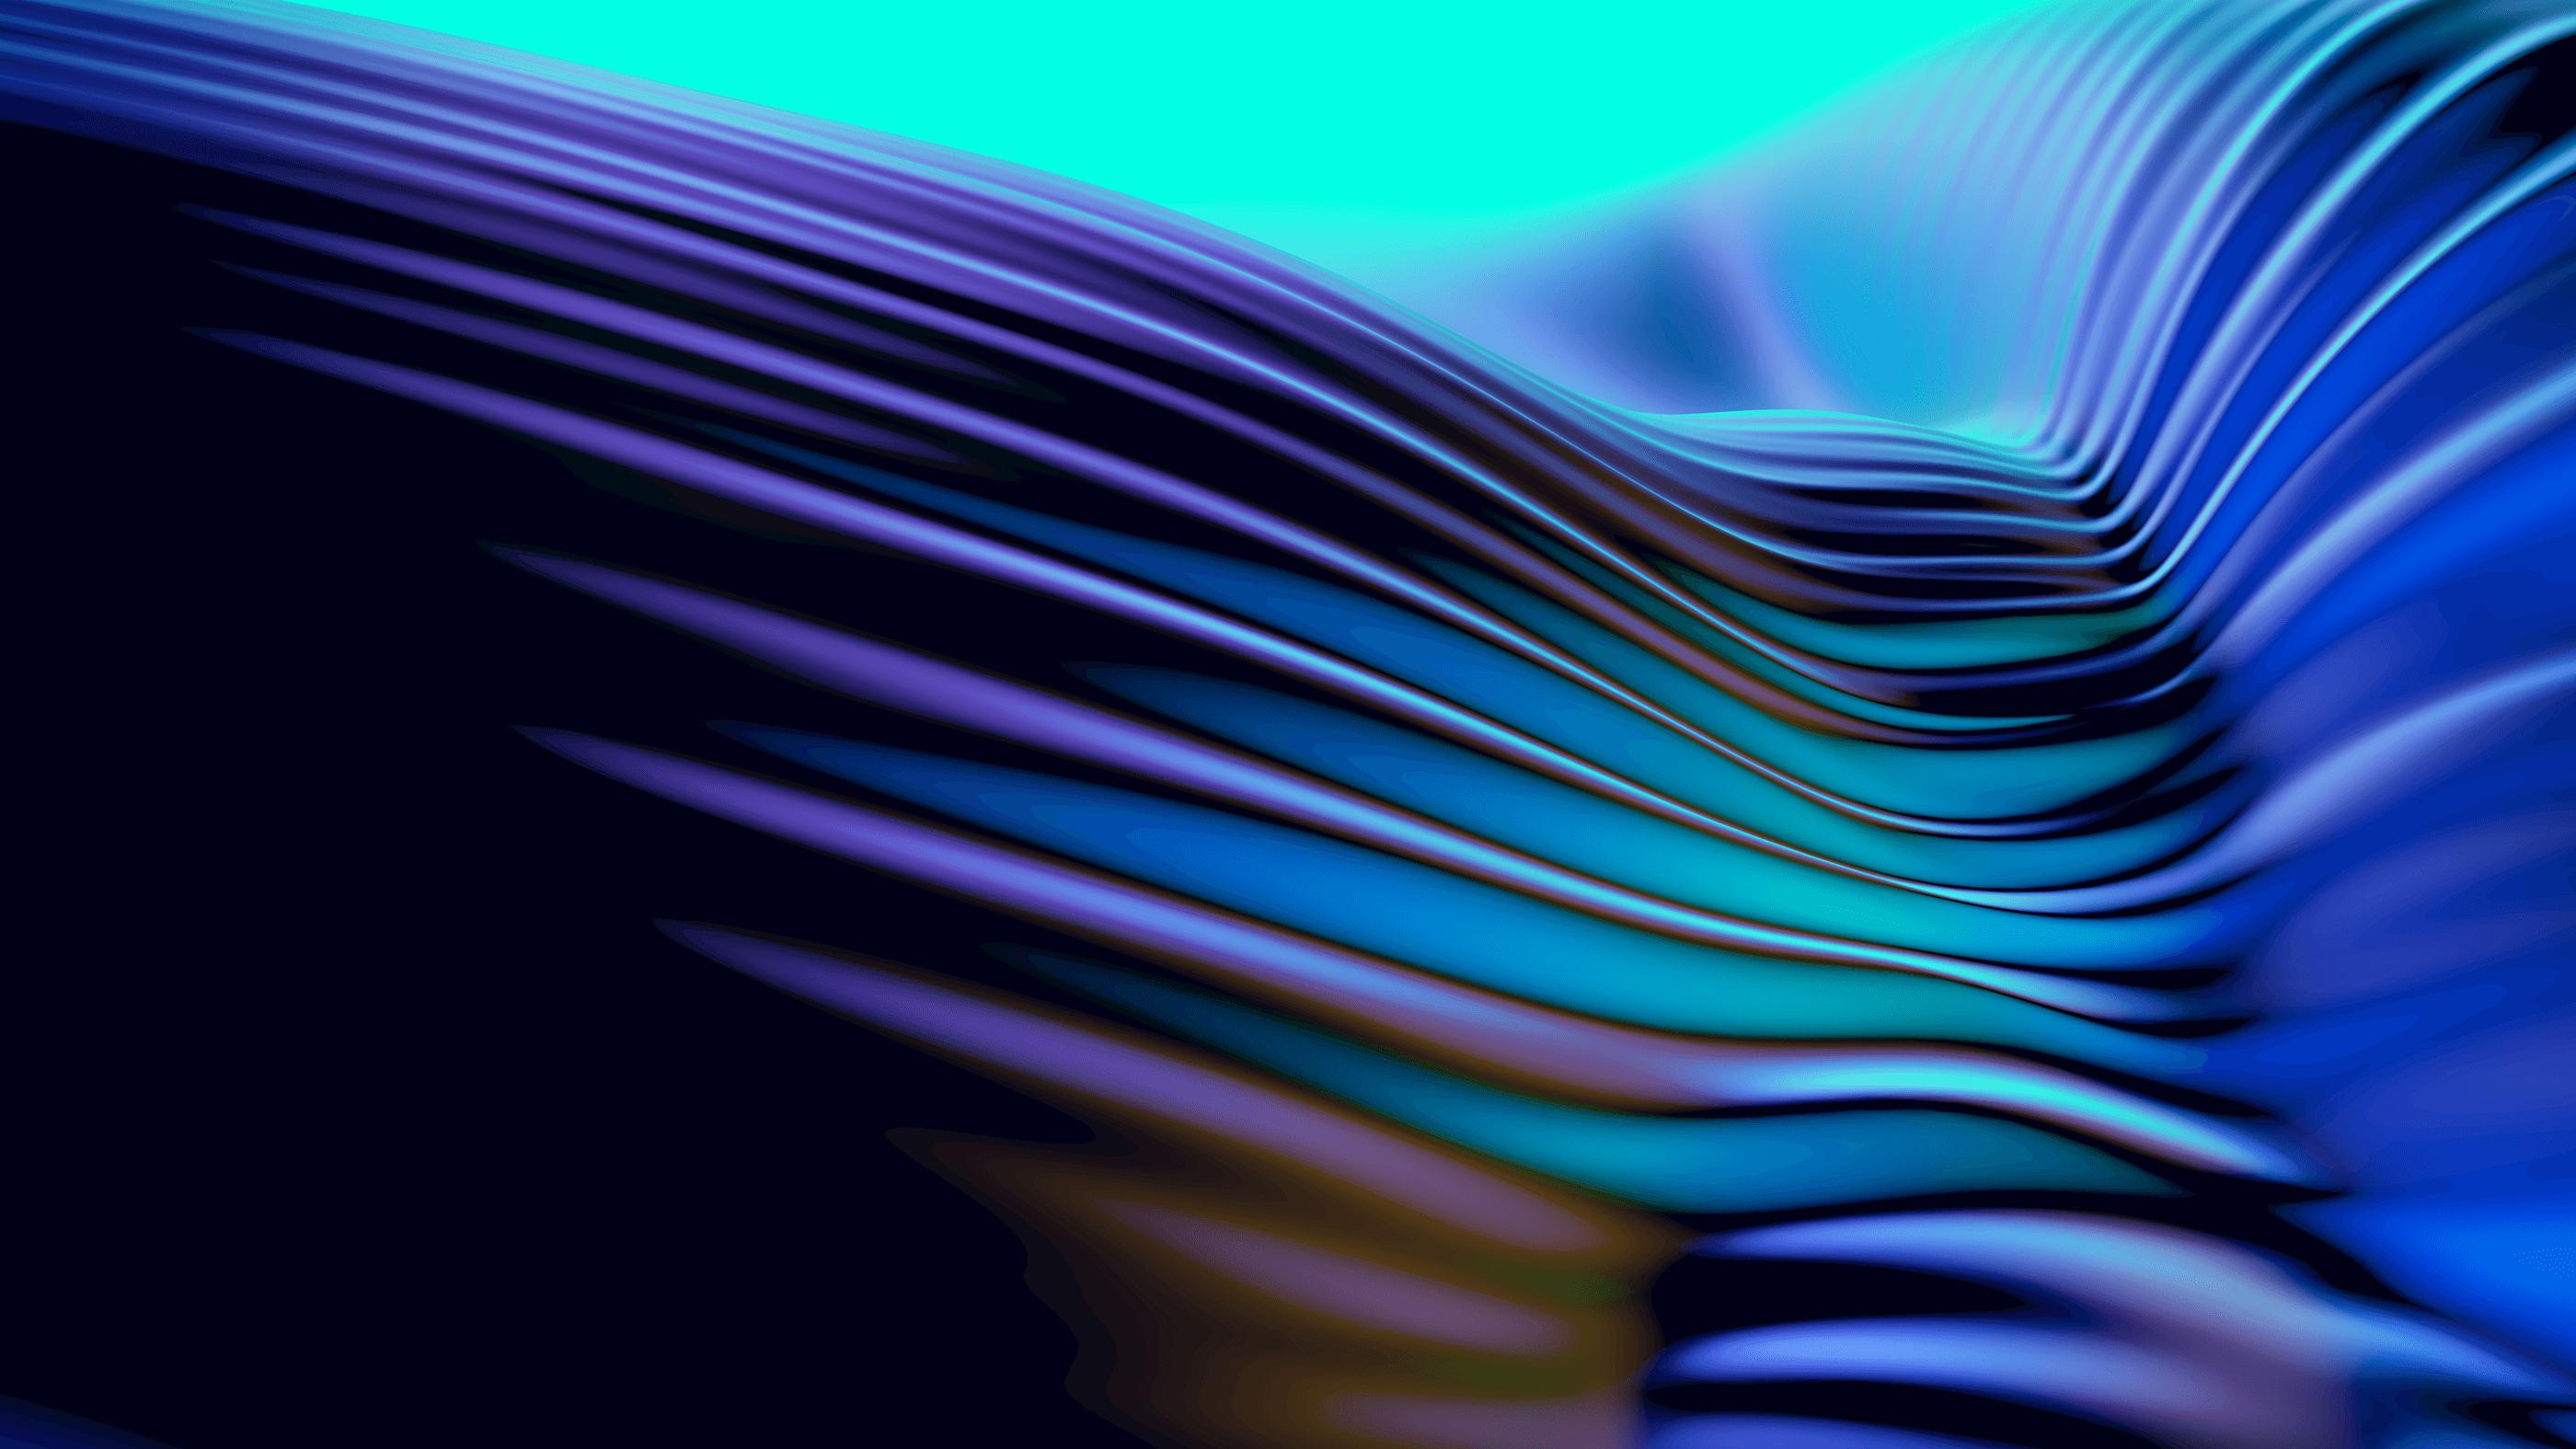 BlueTurquoise 5